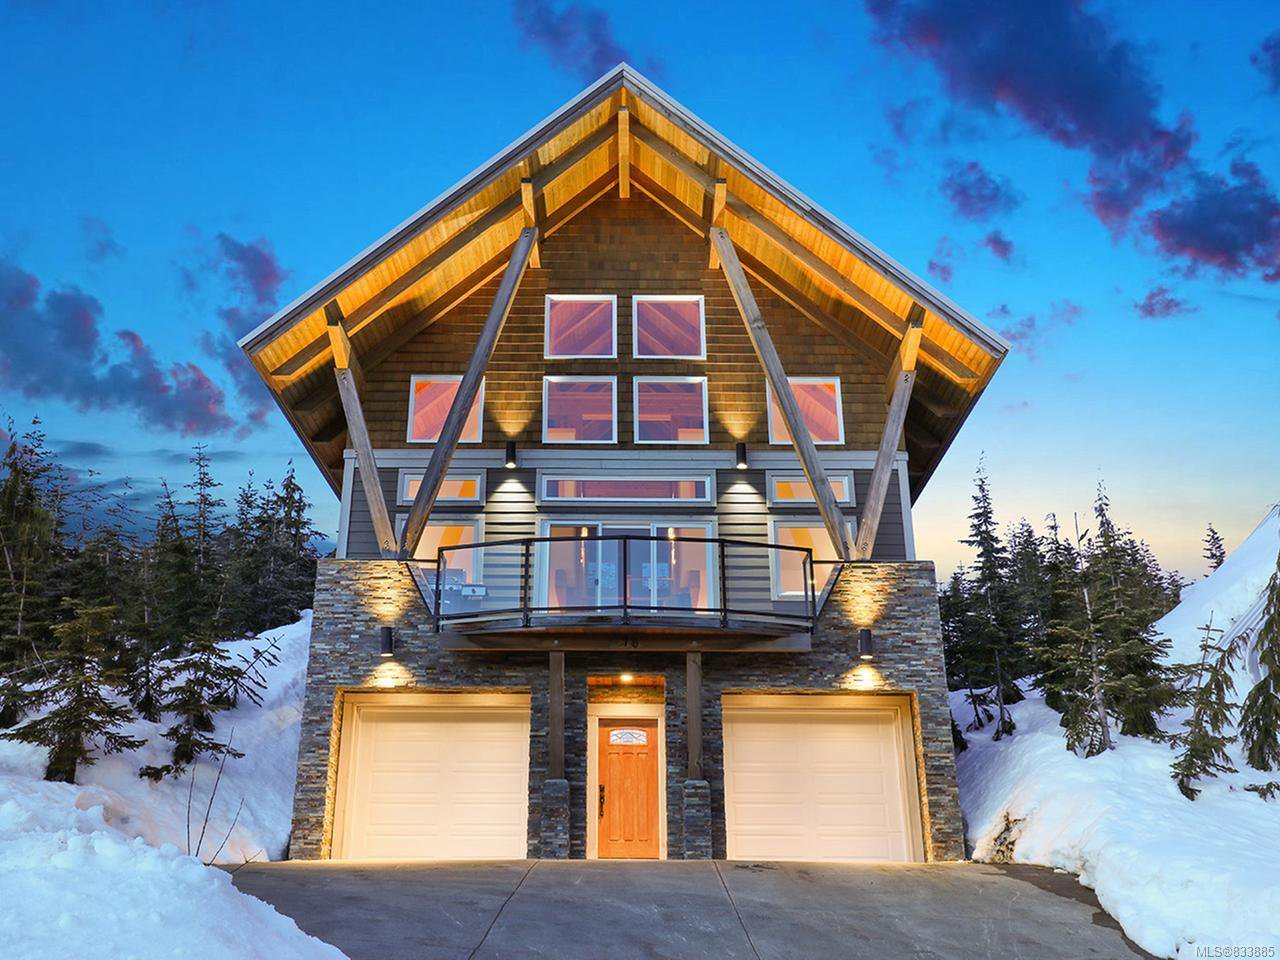 Main Photo: 570 Arrowsmith Ridge in COURTENAY: CV Mt Washington House for sale (Comox Valley)  : MLS®# 833885